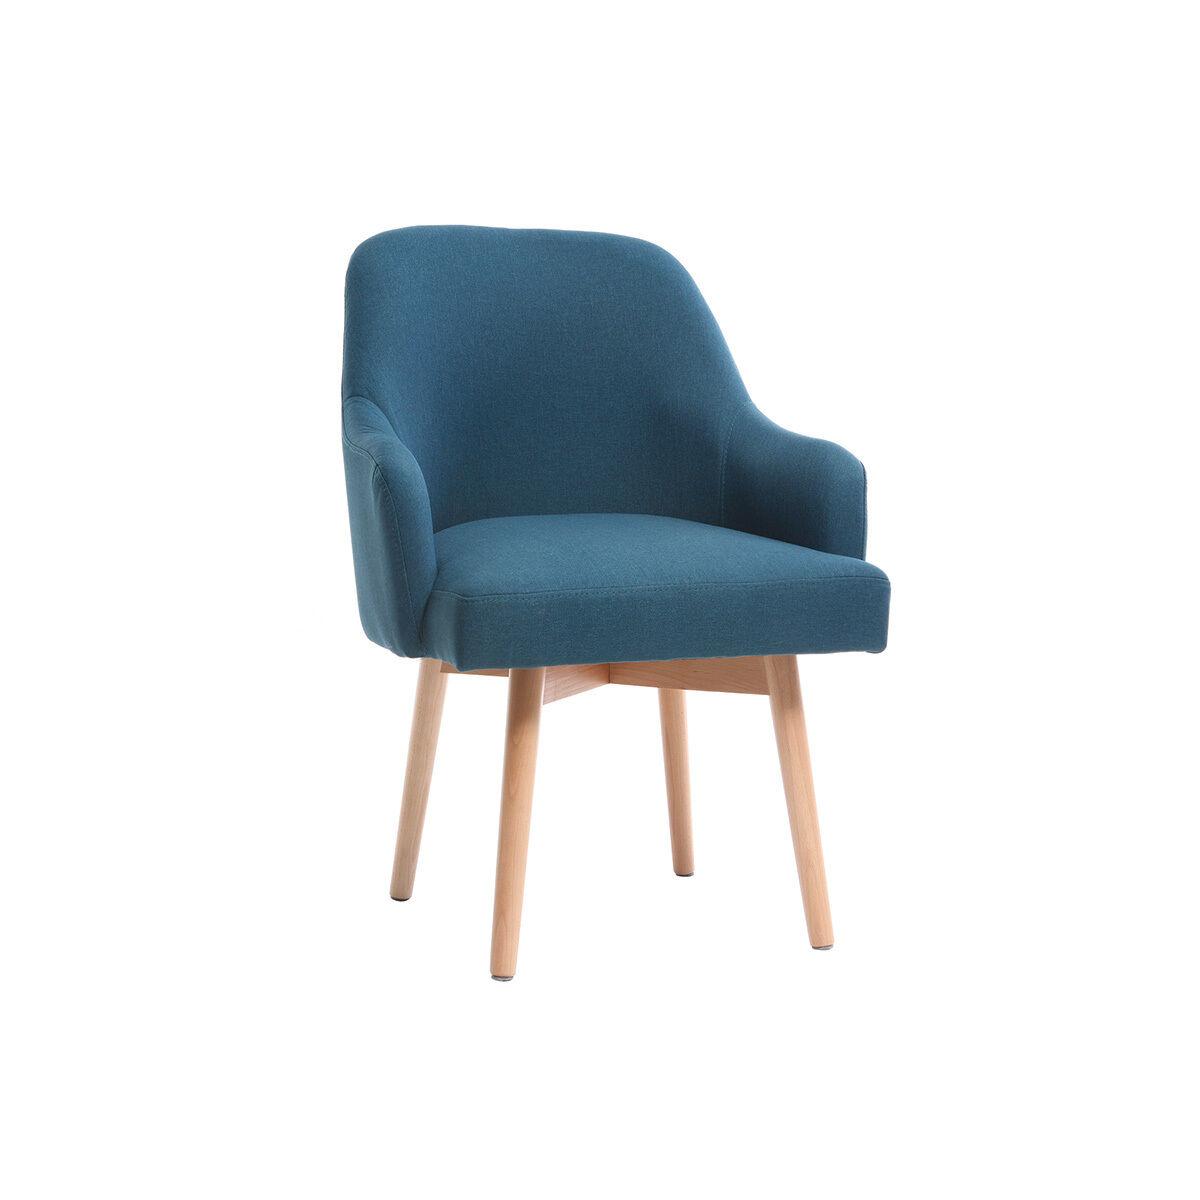 Miliboo Fauteuil scandinave bleu canard et bois clair MONA